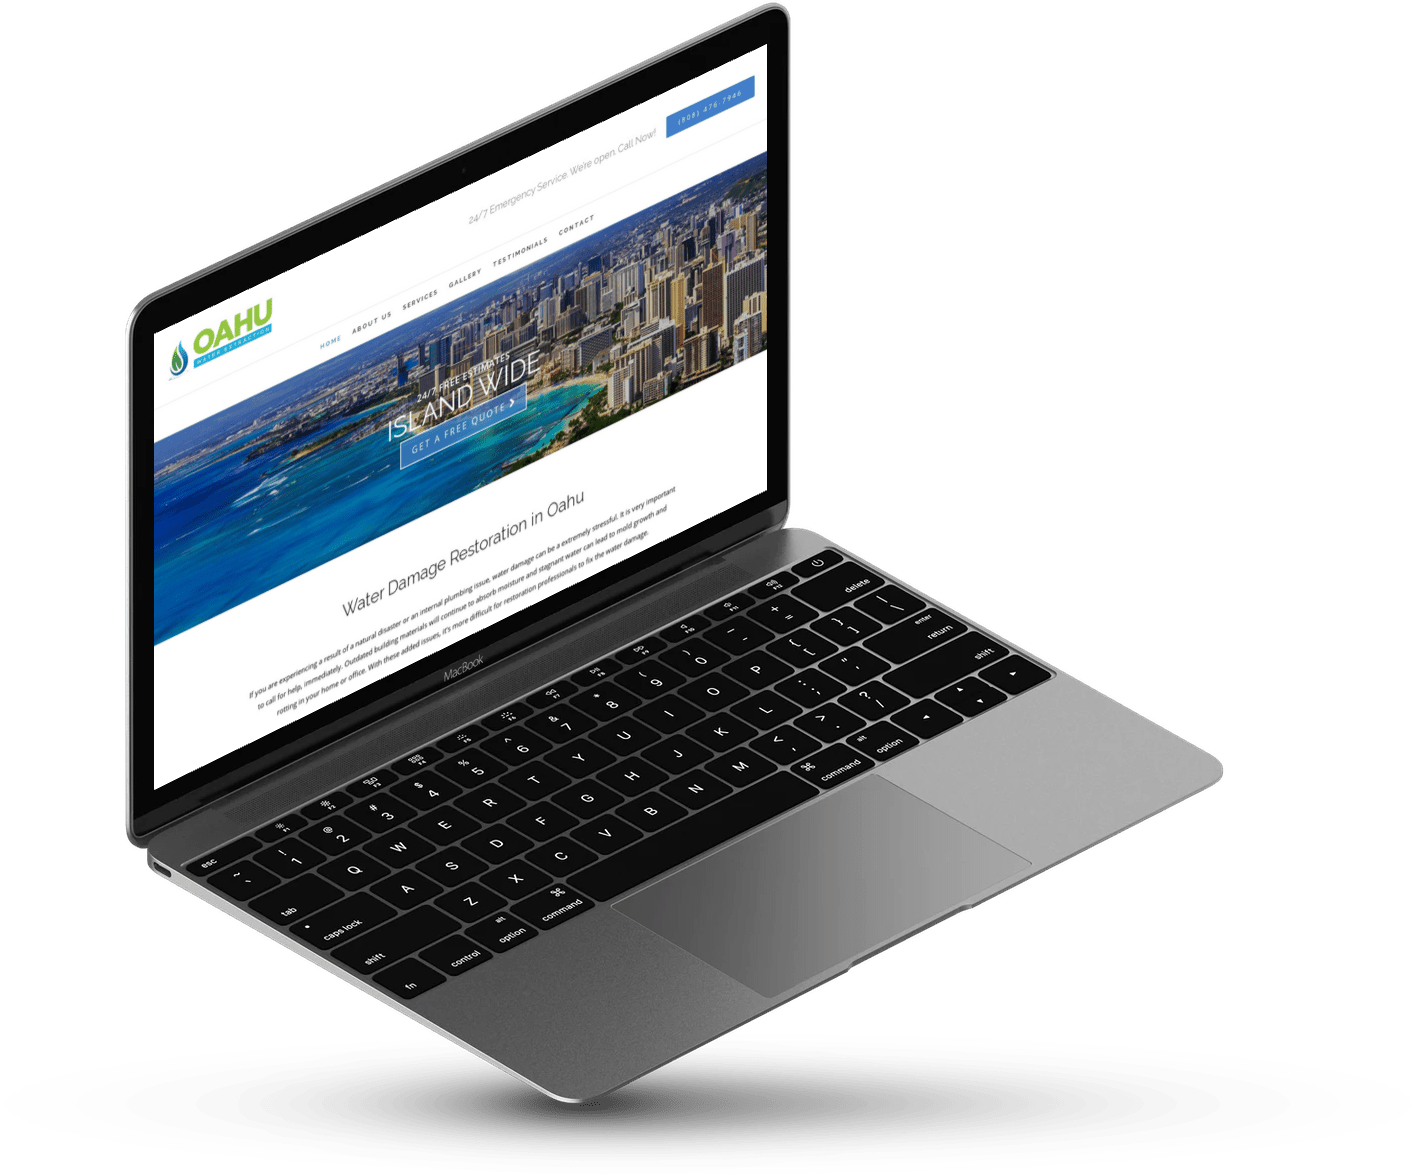 Web Design Company in Oahu Designing Hawaii Agency Case Studies